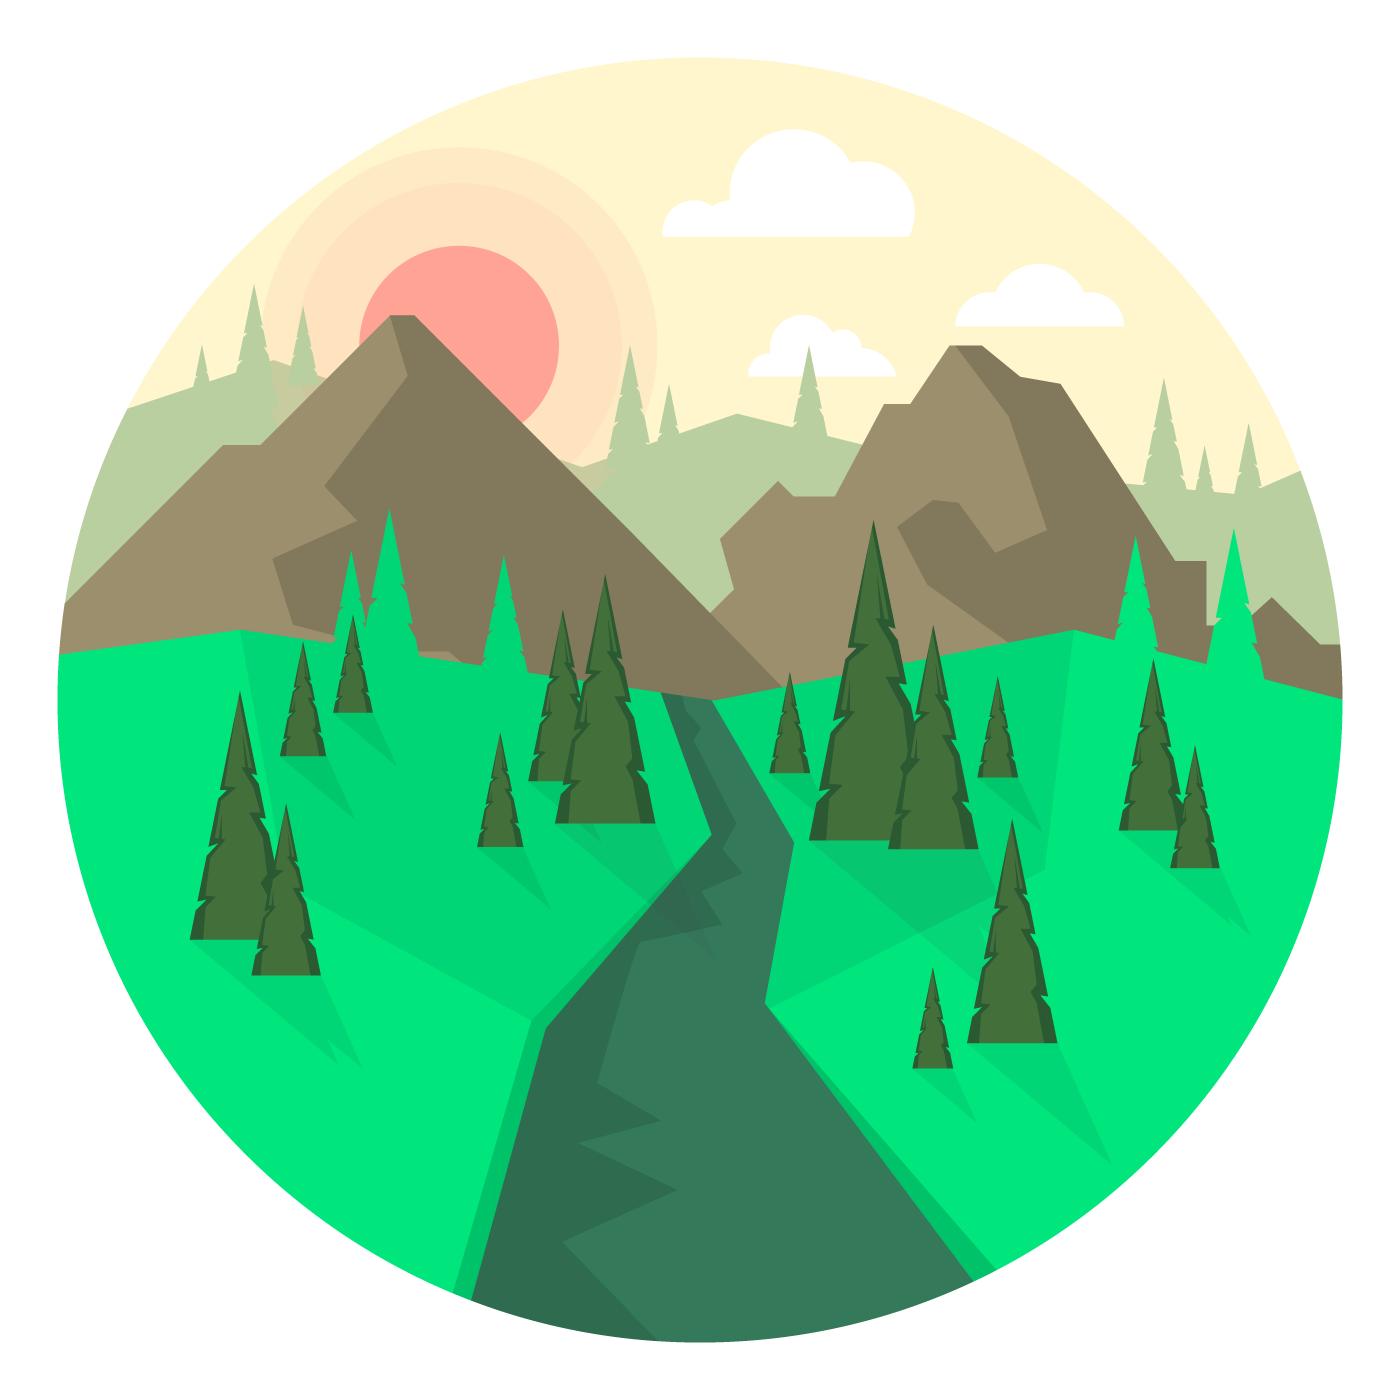 Landscape Design Download Free Vectors Clipart Graphics Vector Art,Pink Baby Shower Nail Designs